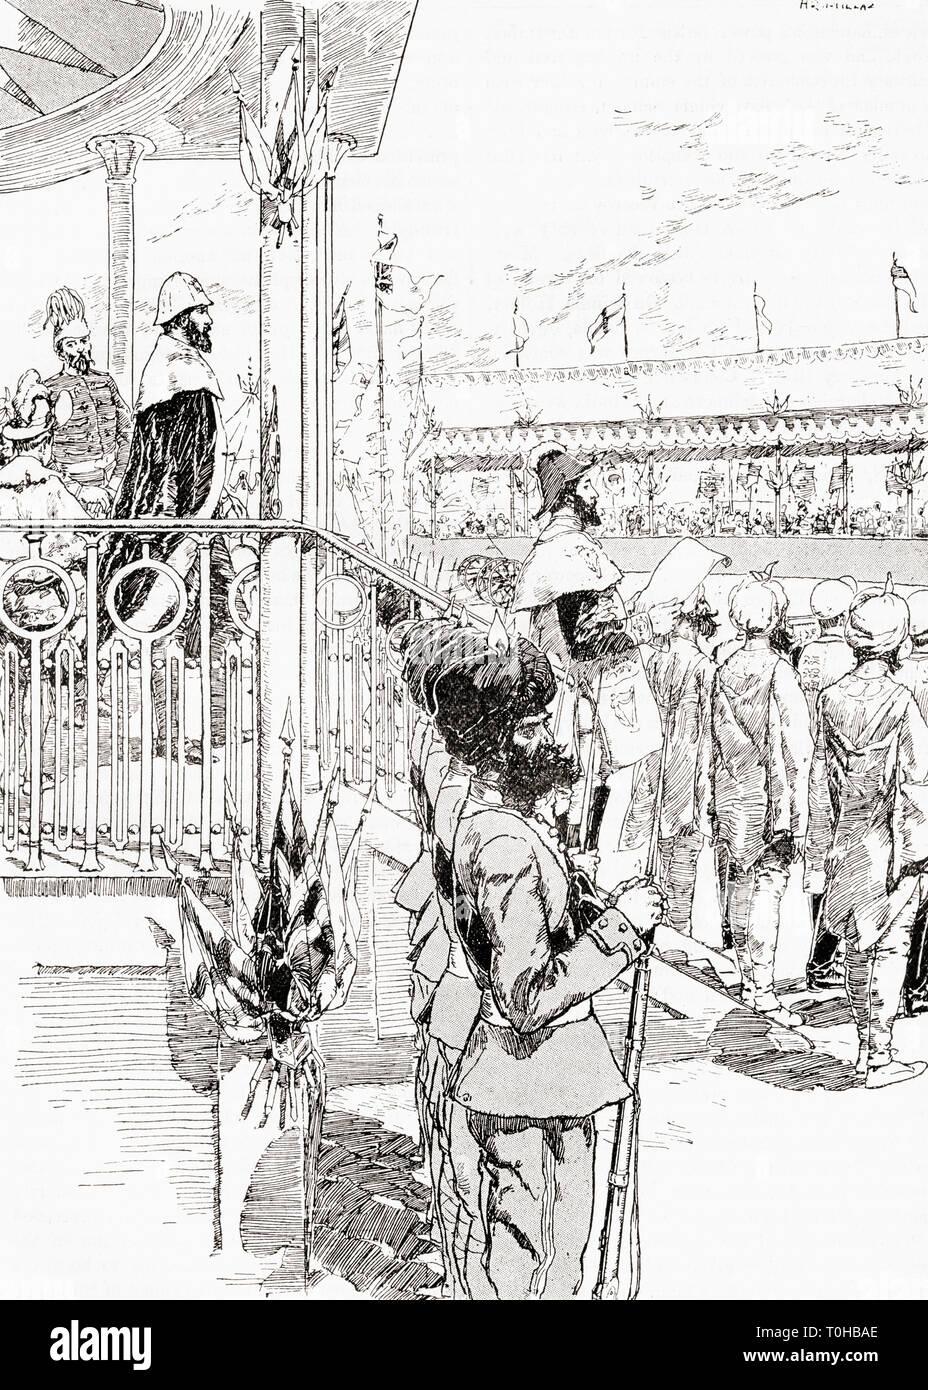 Viceré di India, Robert Bulwer Lytton, Delhi, 1877 Foto Stock